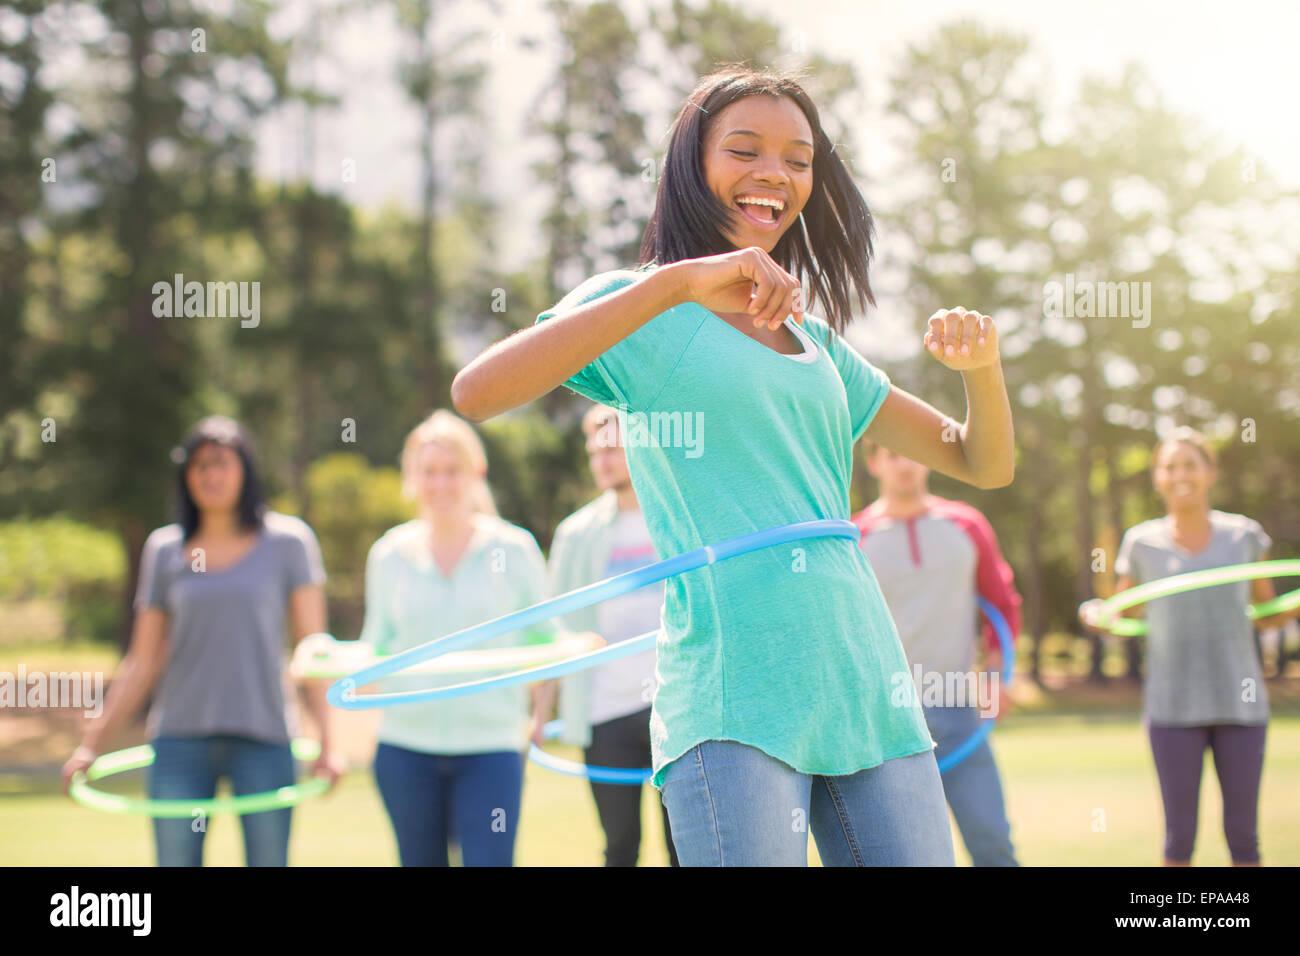 Begeisterung Frau Spinning Kunststoff hoop Stockbild